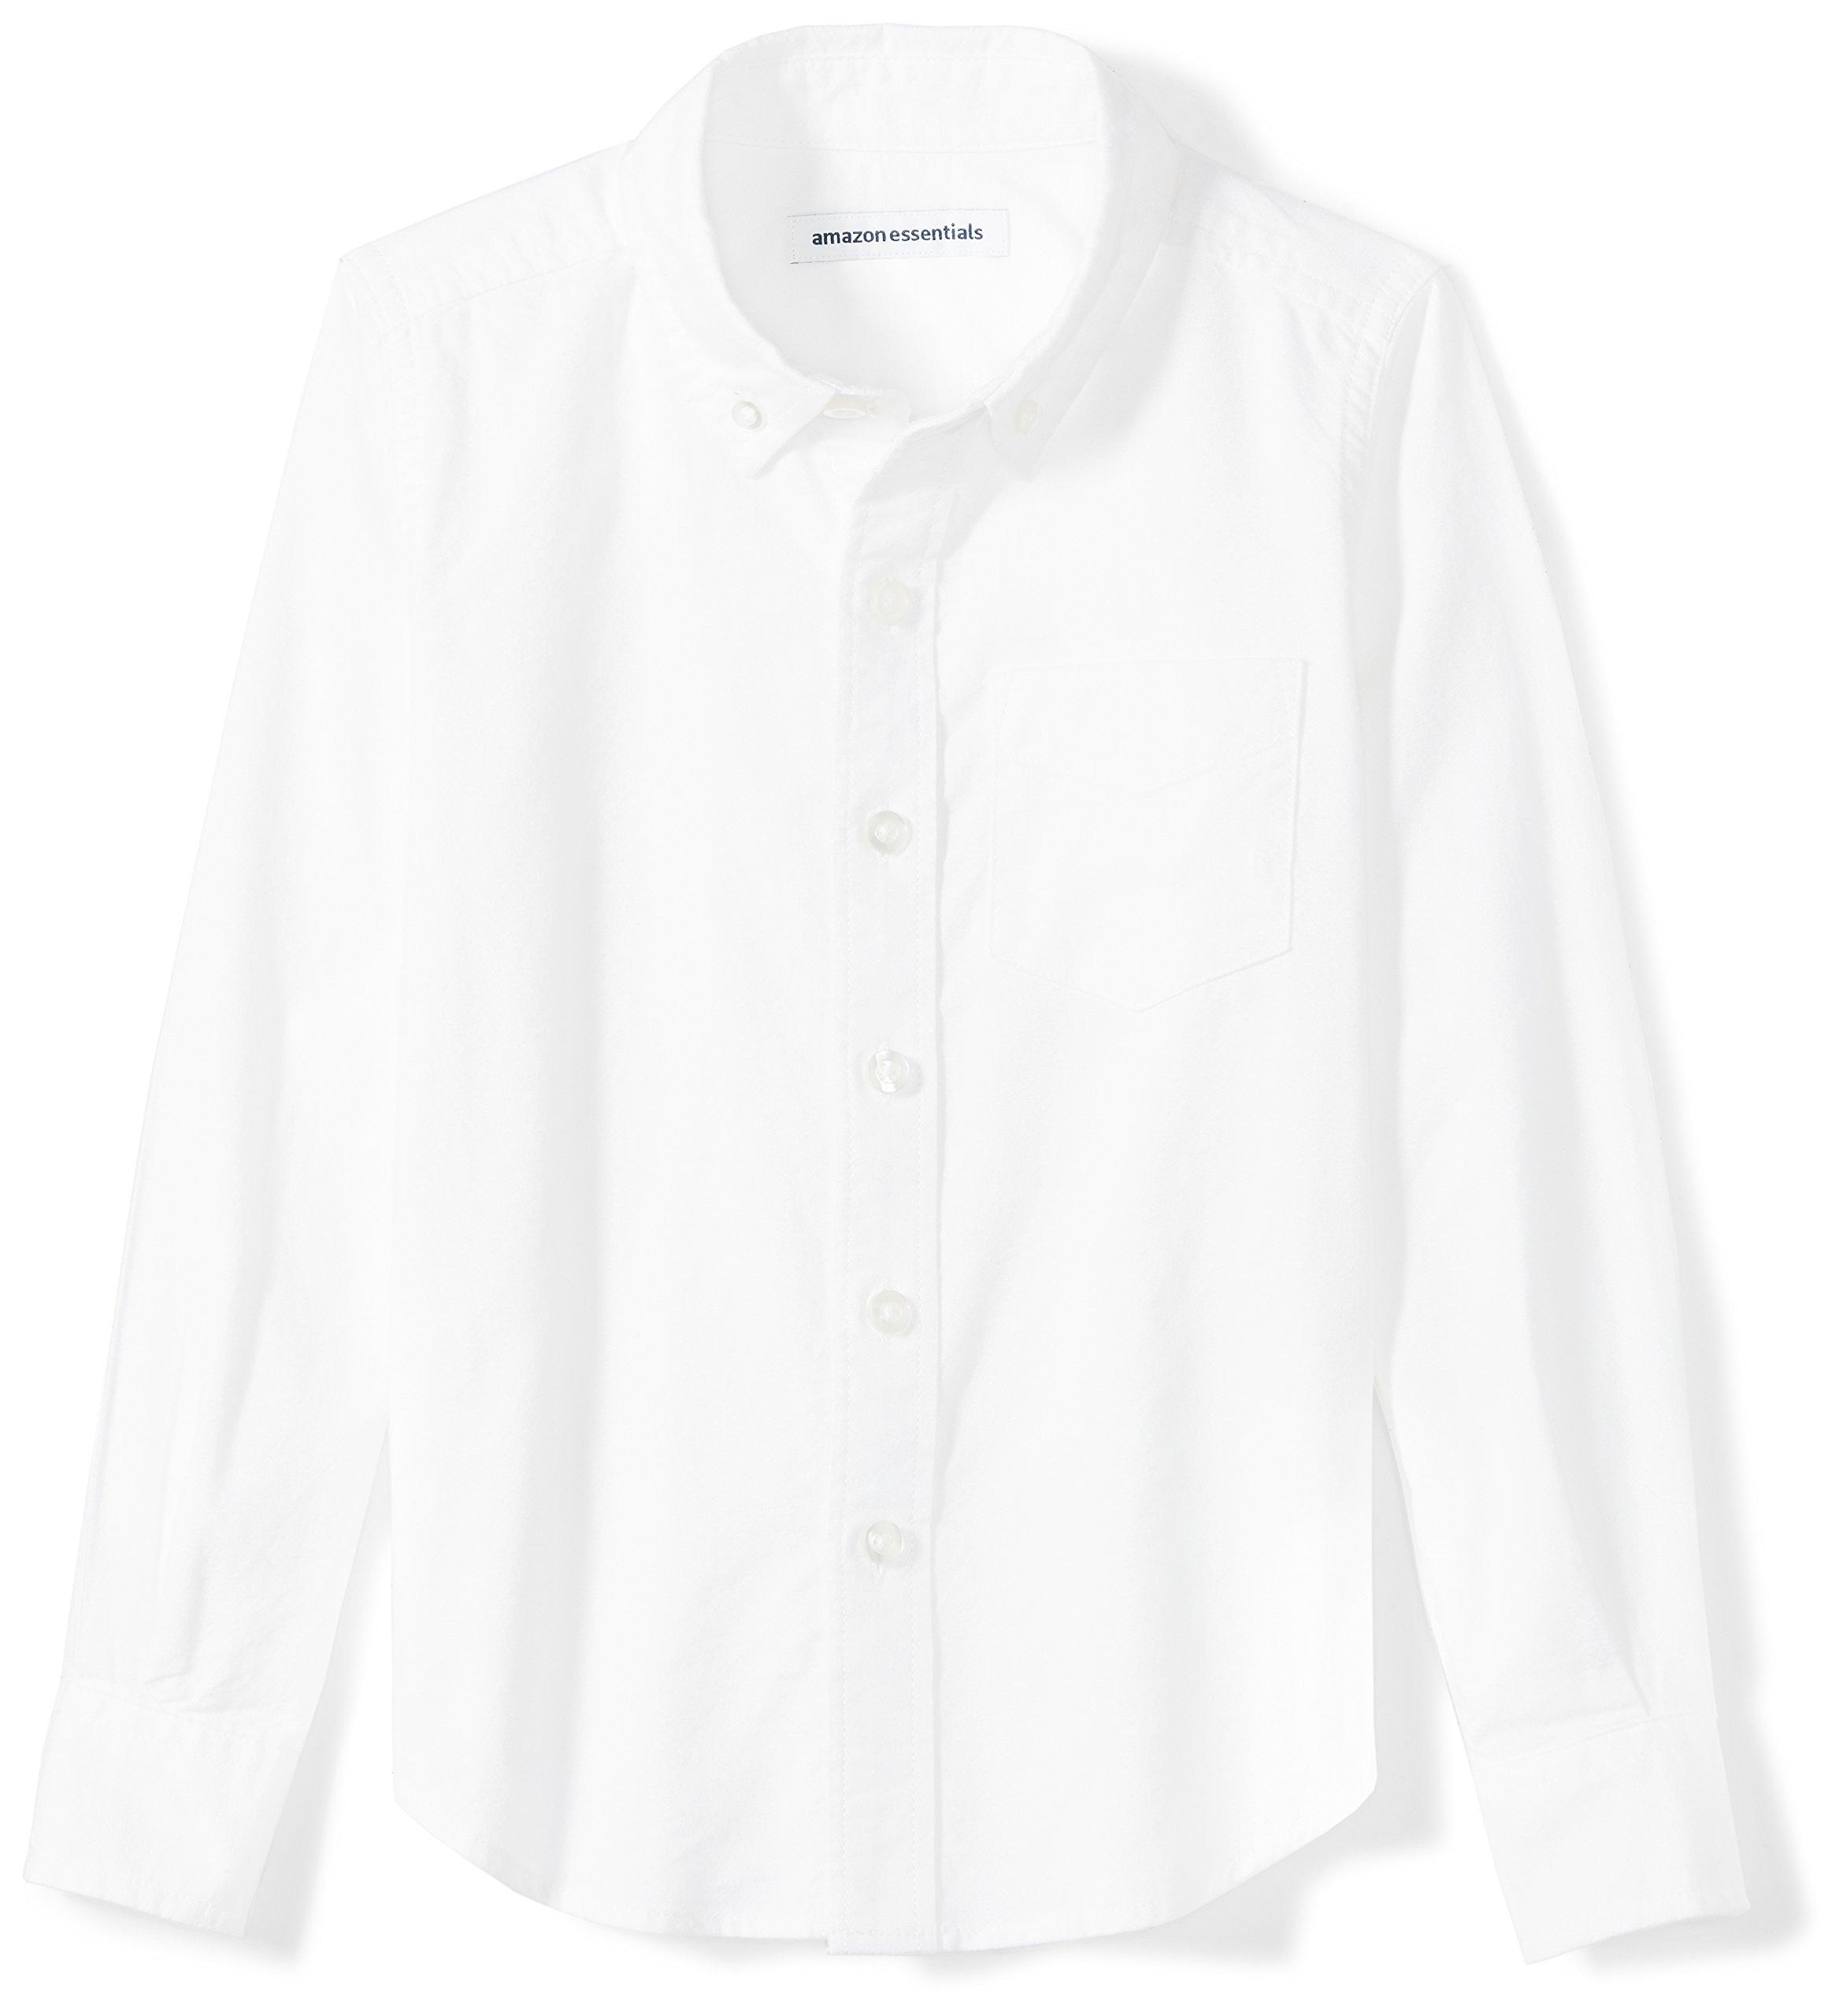 Amazon Essentials Boys' Long-Sleeve Uniform Oxford Shirt, White, M (8)